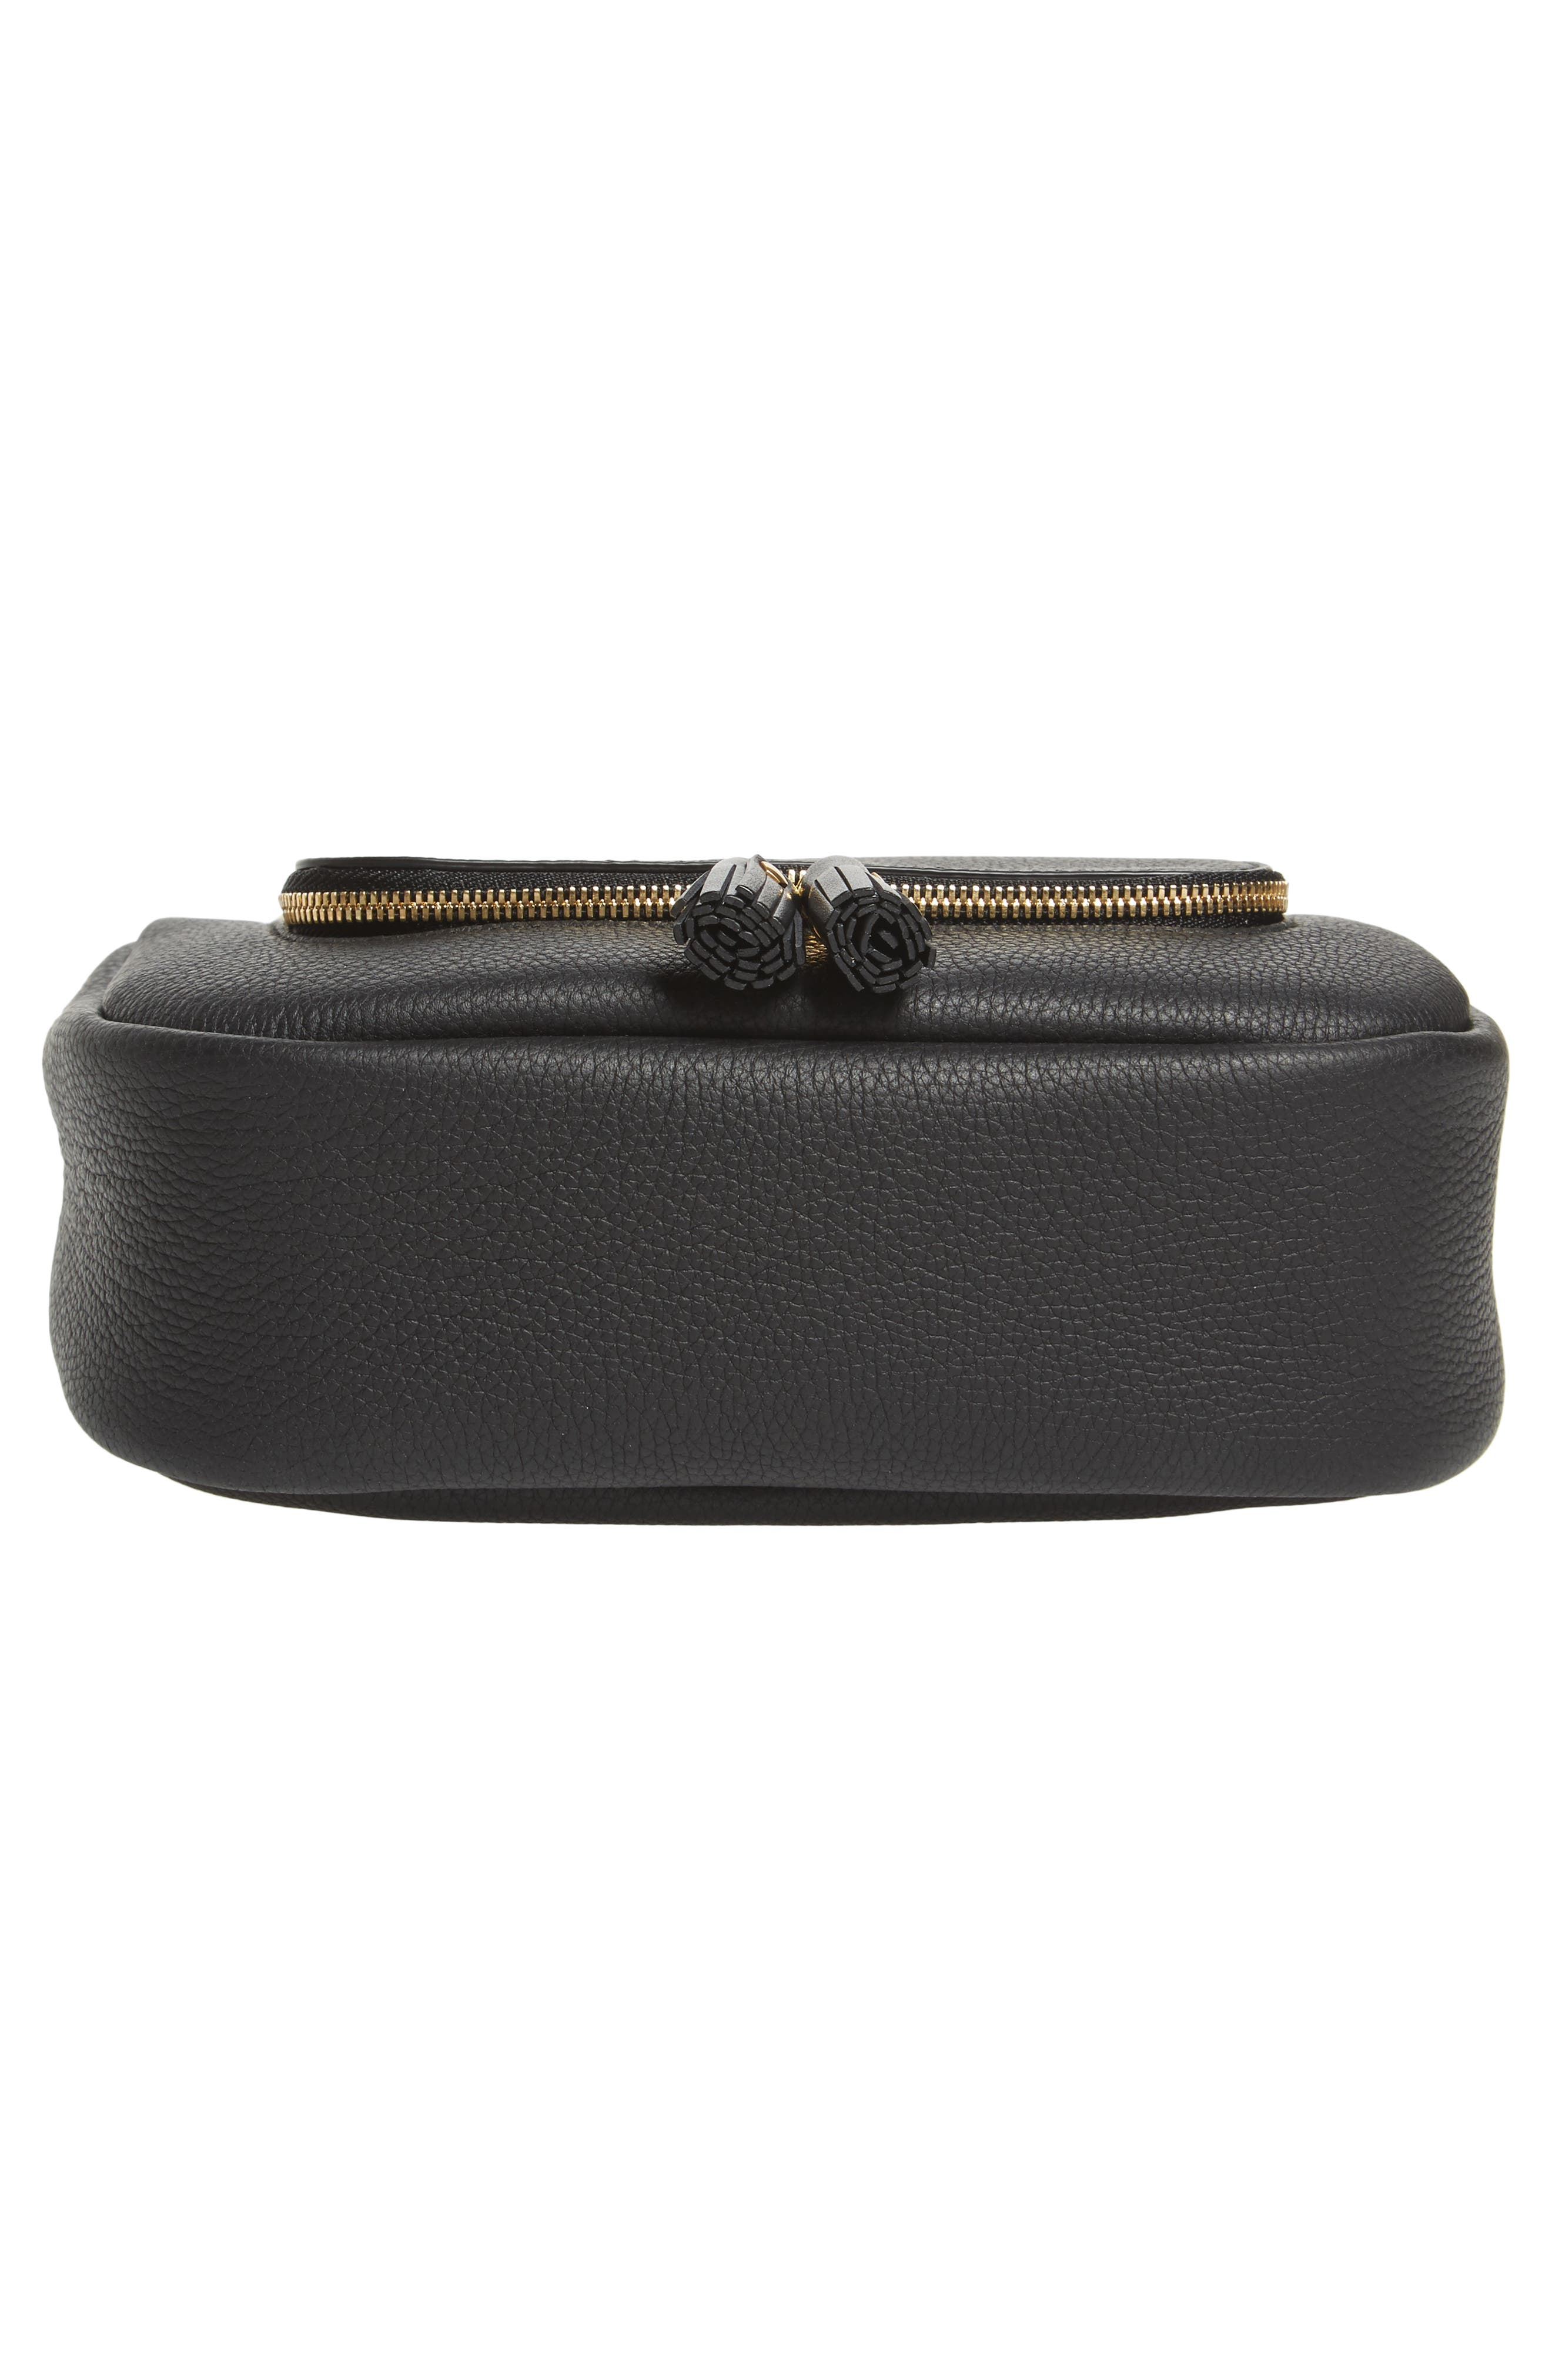 Small Vere Leather Crossbody Satchel,                             Alternate thumbnail 6, color,                             BLACK